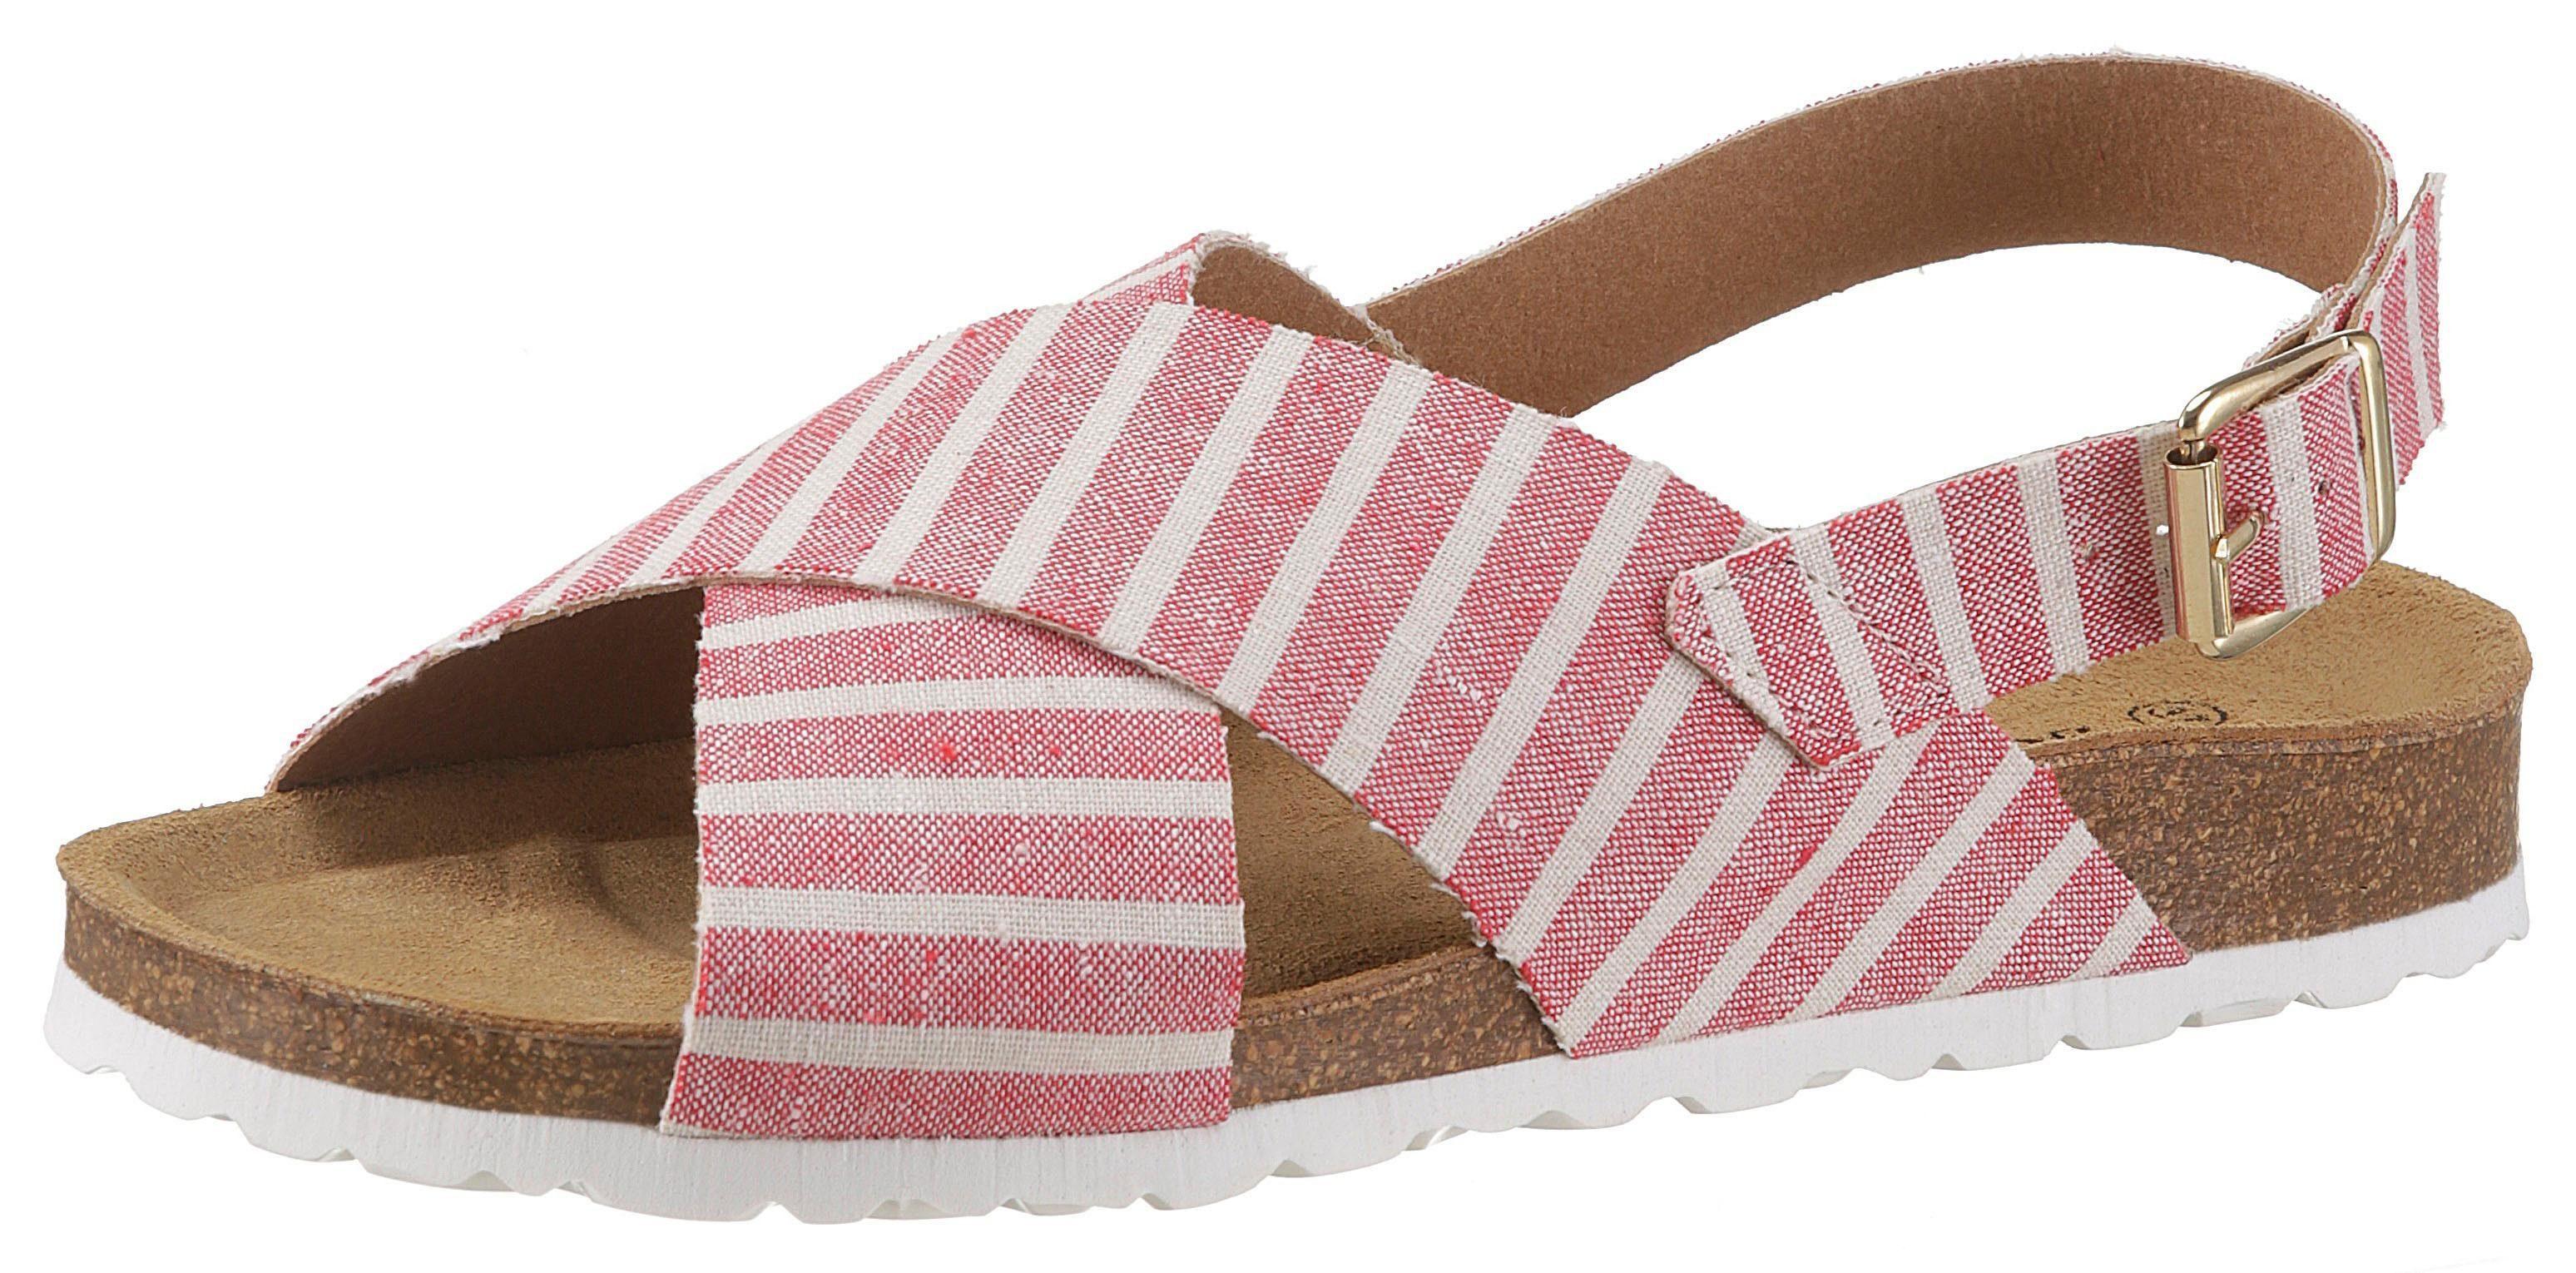 thies sandalen